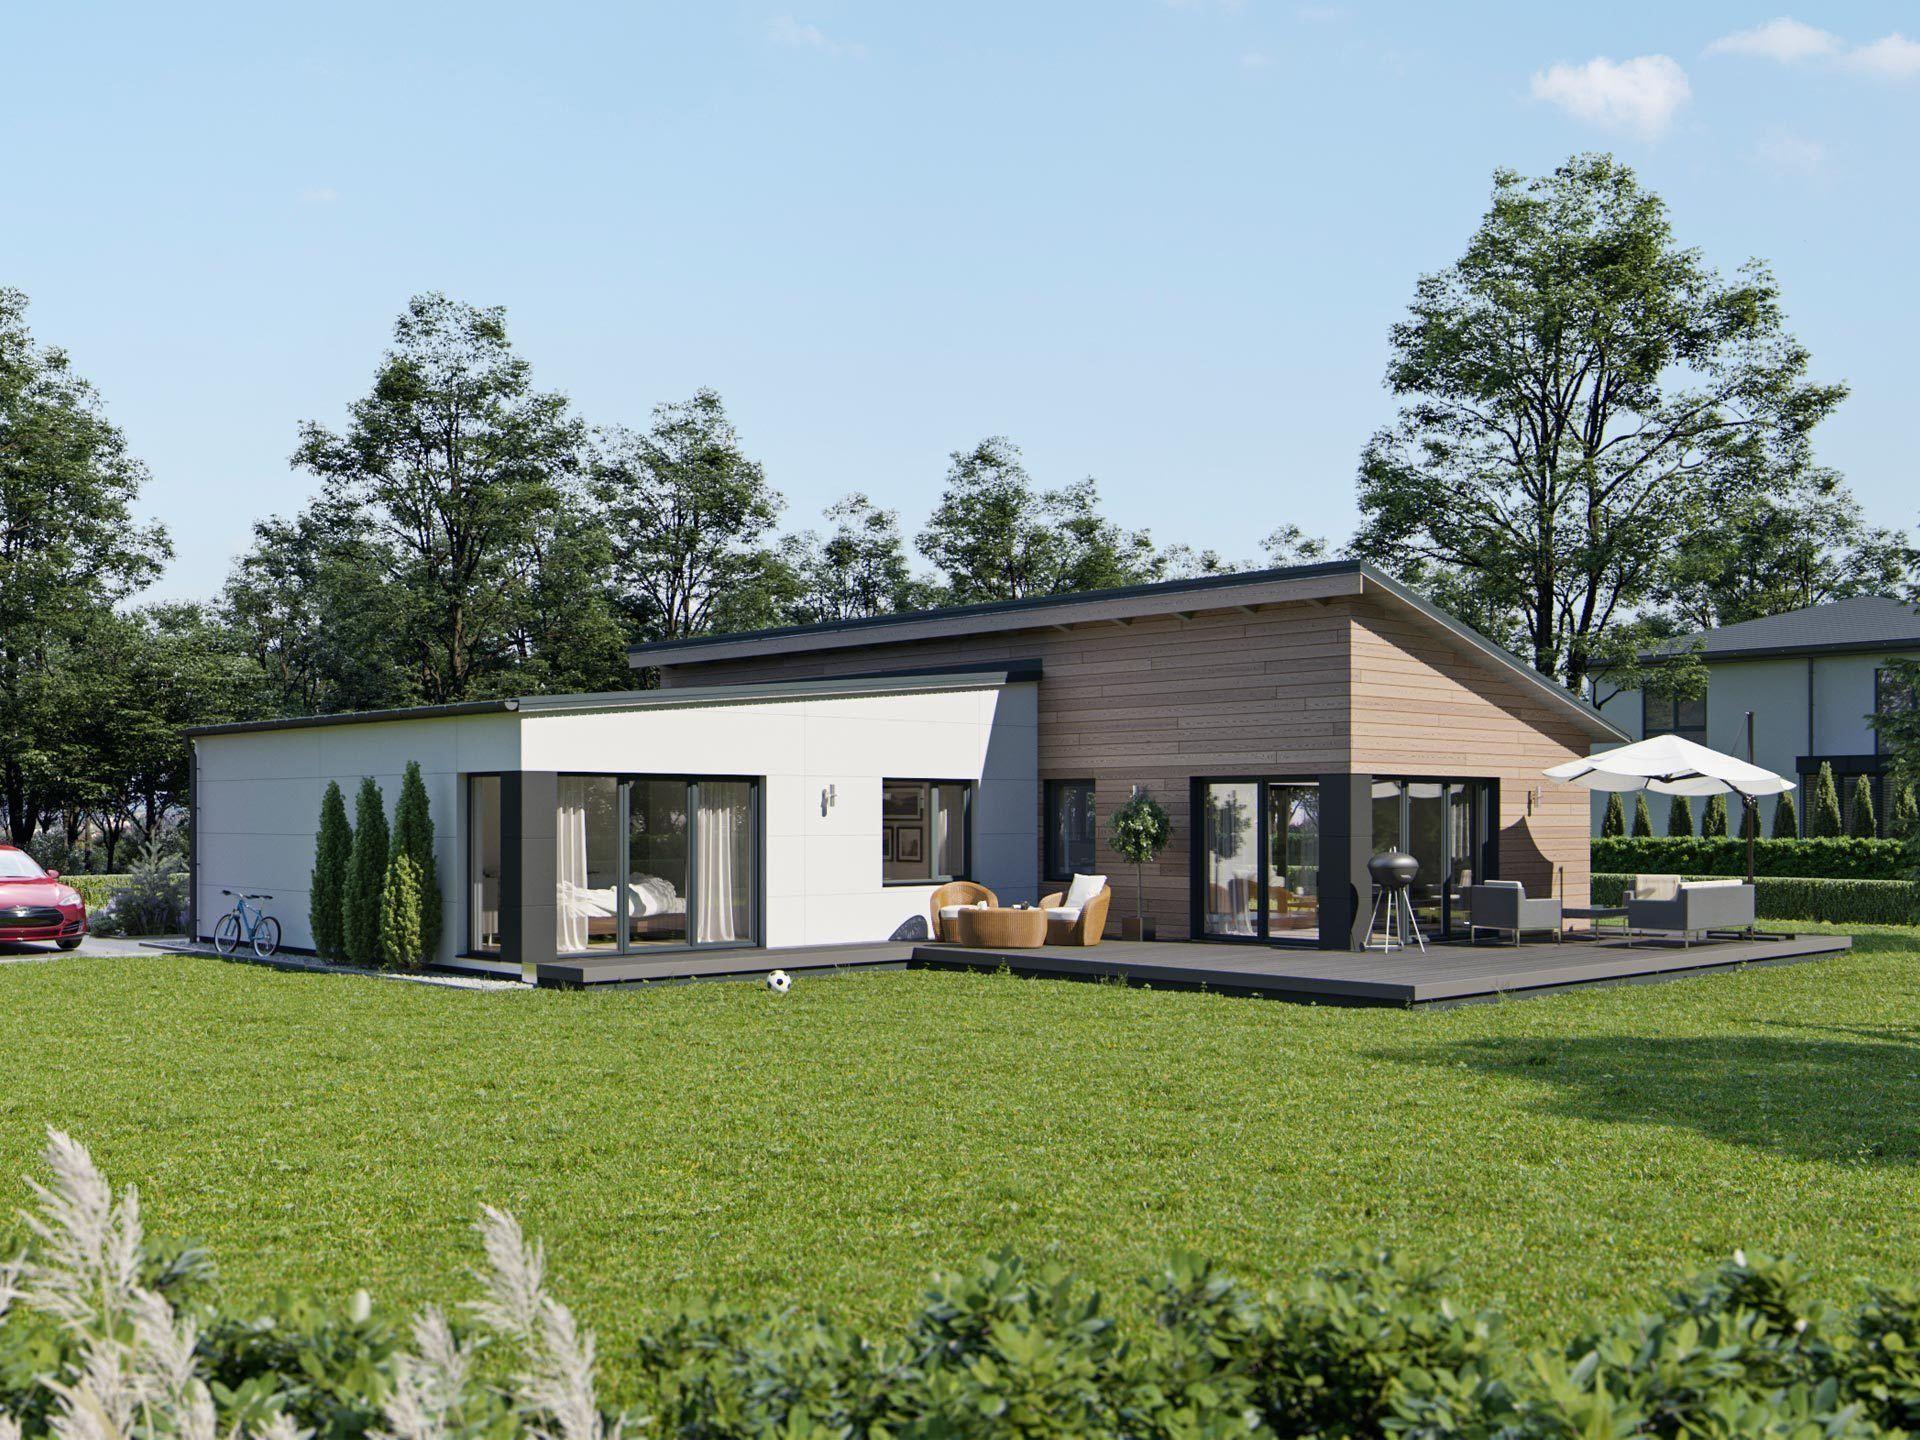 bungalow lessingstra e 129 haus pinterest haus bungalow und haus bauen. Black Bedroom Furniture Sets. Home Design Ideas